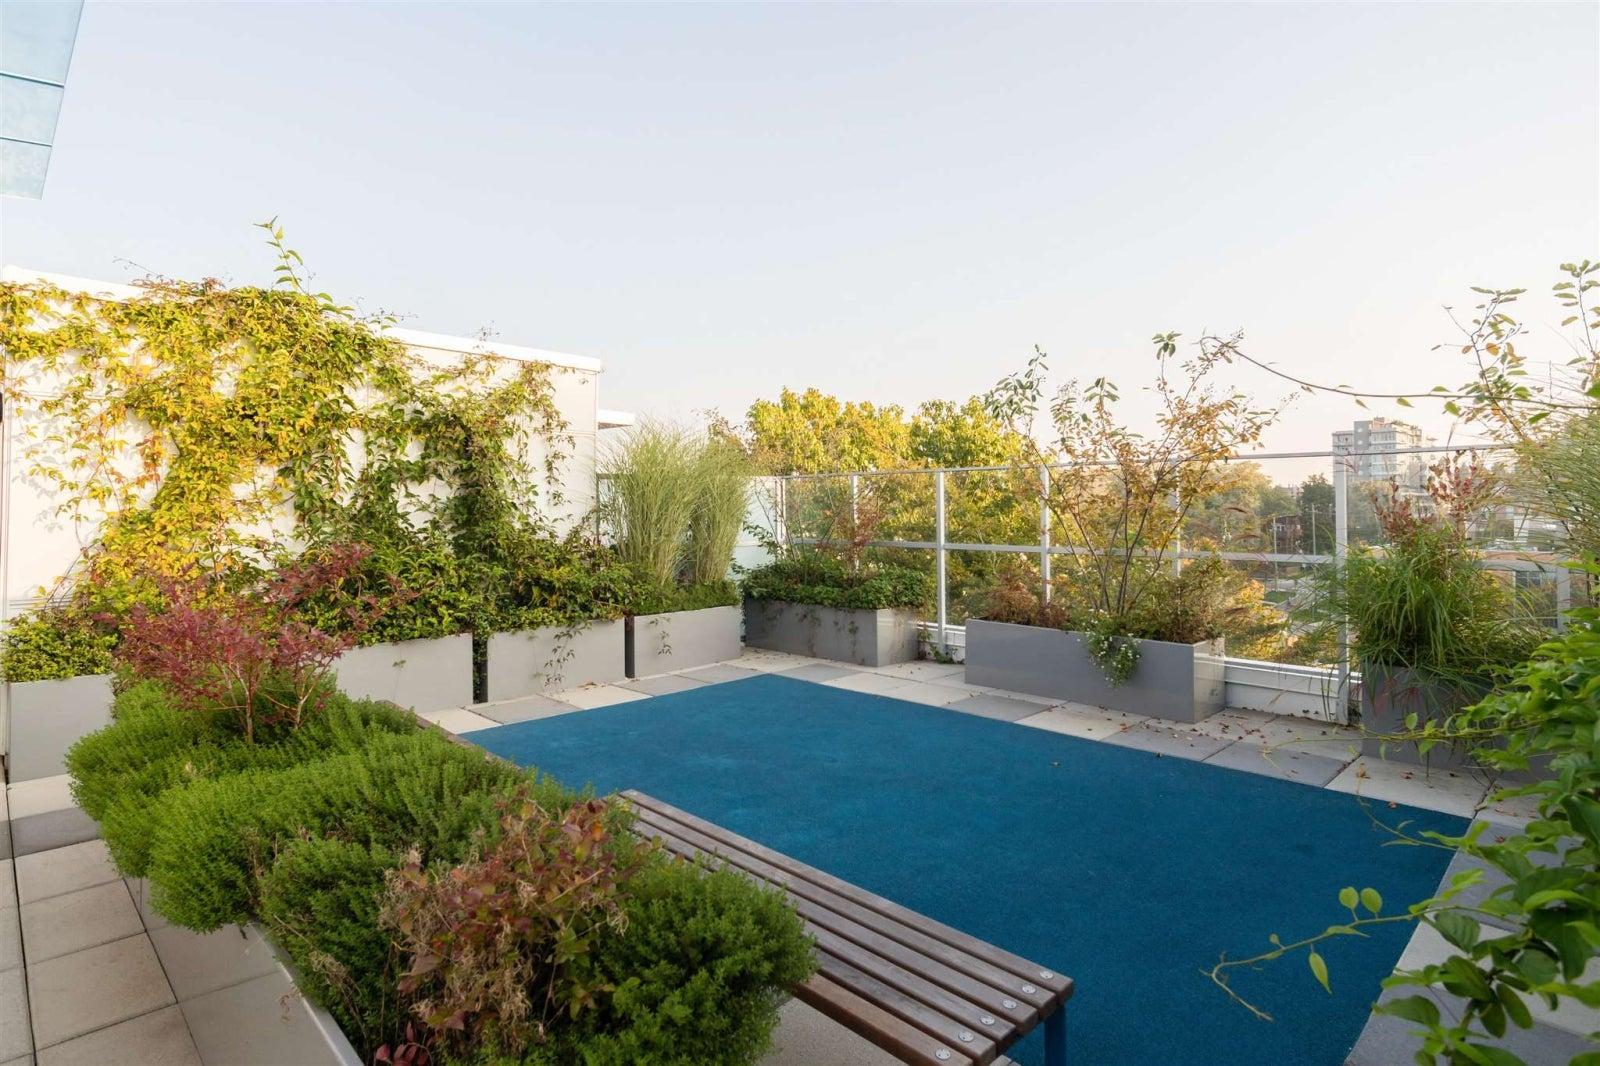 408 379 E BROADWAY AVENUE - Mount Pleasant VE Apartment/Condo for sale, 2 Bedrooms (R2599900) #30